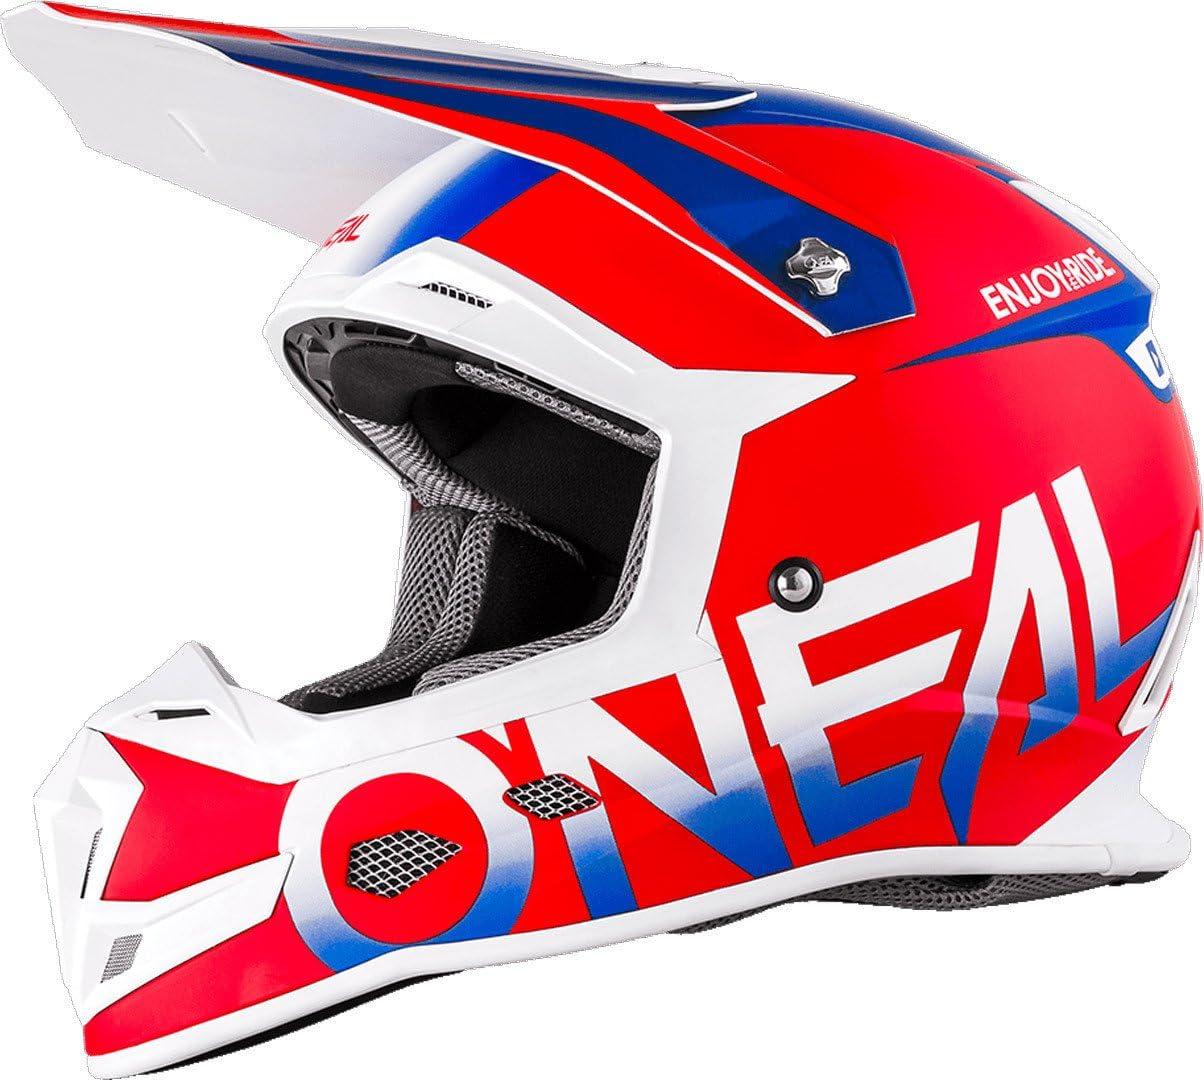 61-62cm Oneal 5 Series Blocker Motocross Enduro MTB Helm rot//blau//wei/ß 2018 Oneal Gr/ö/ße XL